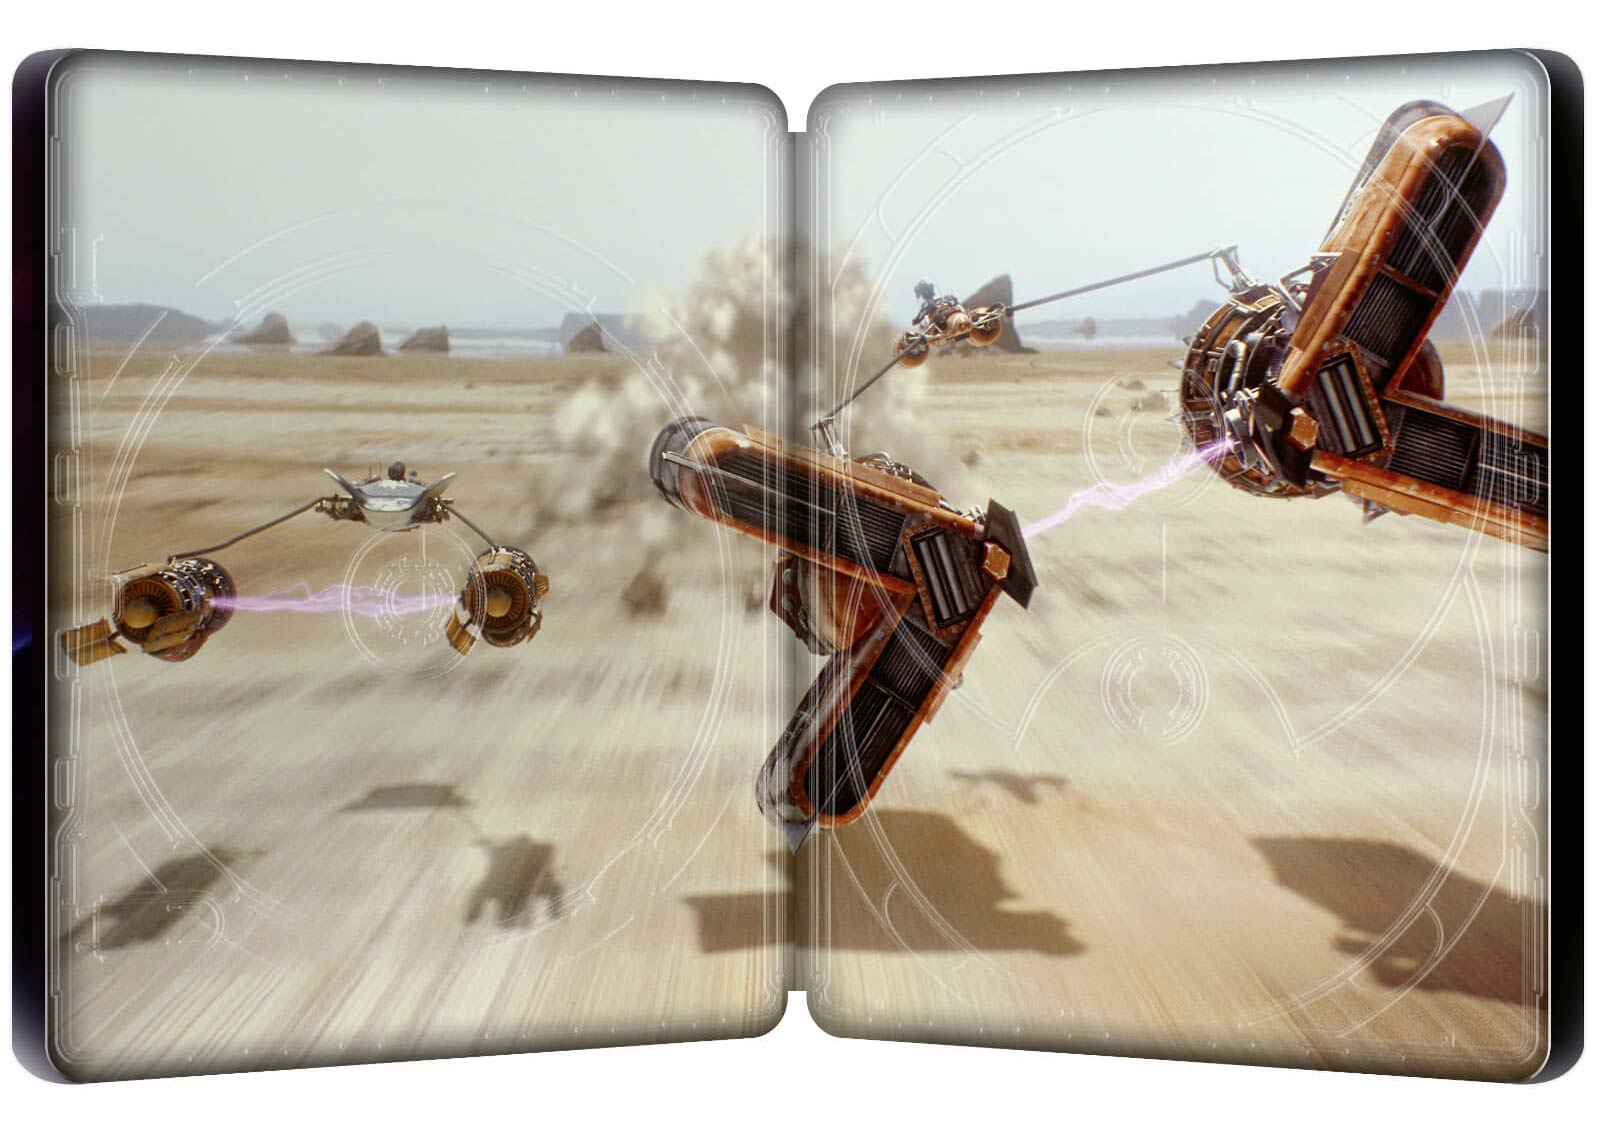 Star Wars: Episode I - The Phantom Menace (4K+2D Blu-ray SteelBook) Zavvi Star-Wars-The-Phantom-Menace-steelbook-4K-3